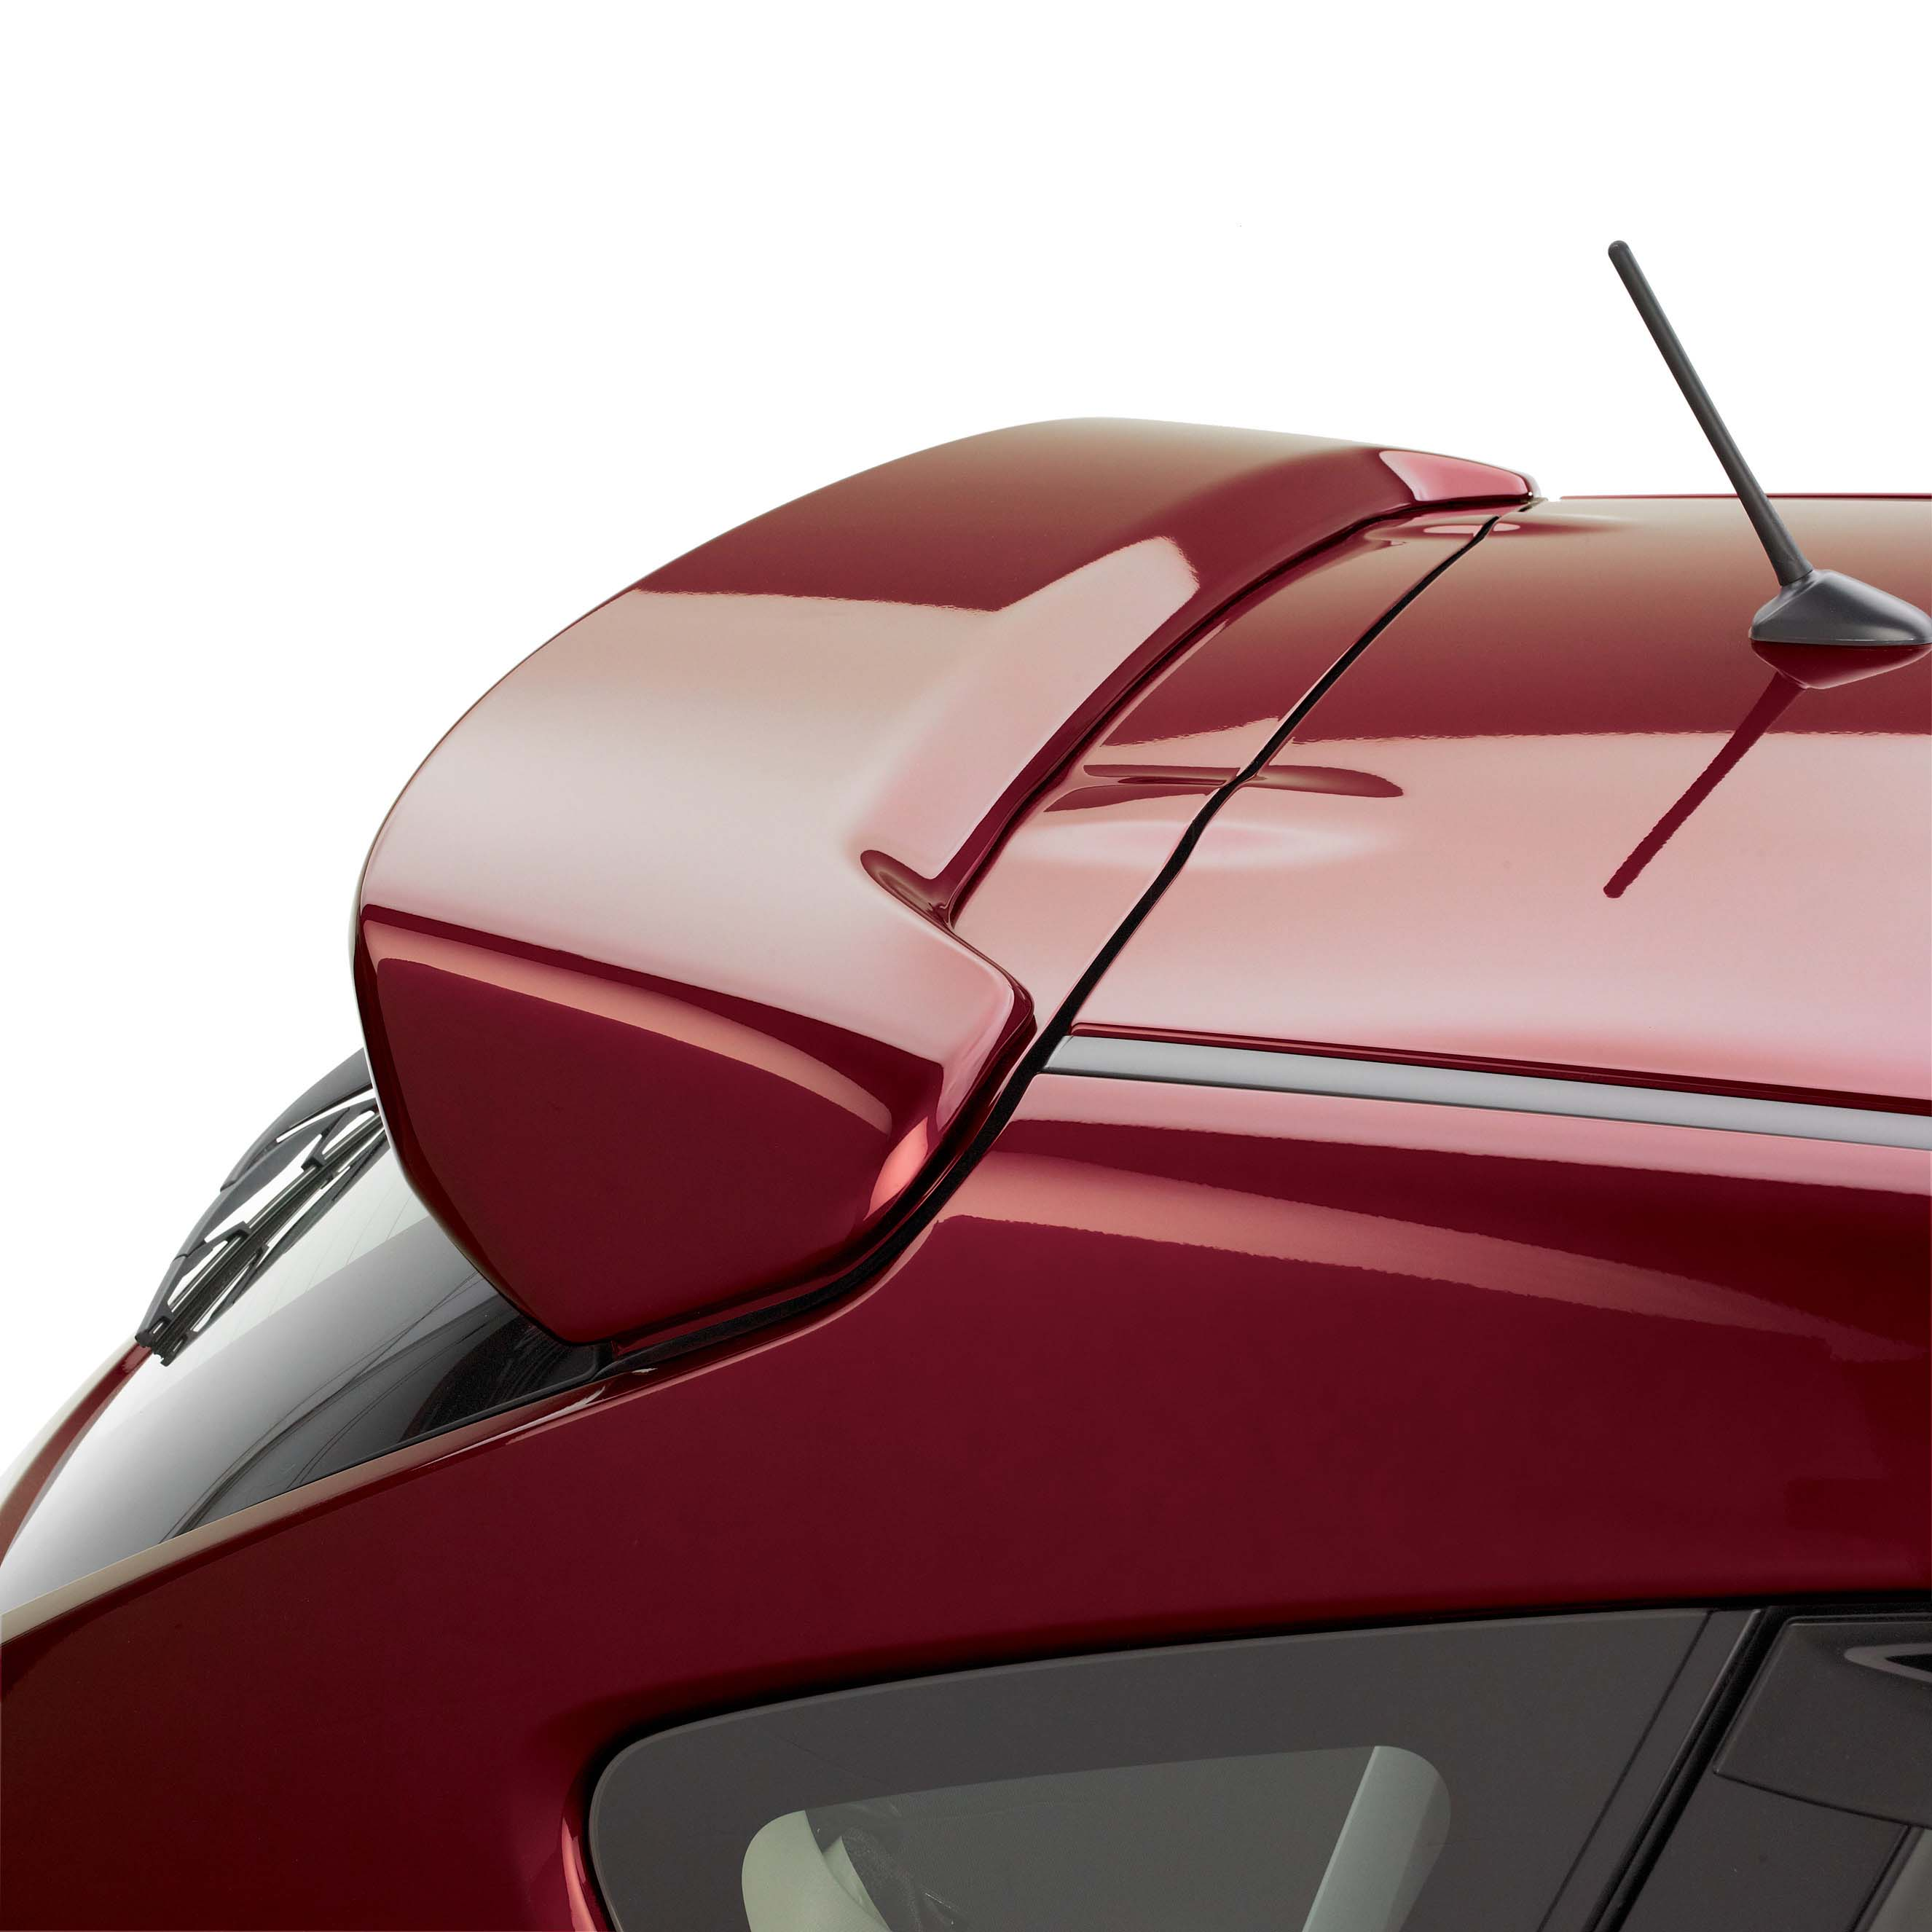 2016 Subaru Crosstrek Roof Spoiler 5dr Adds A Sporty